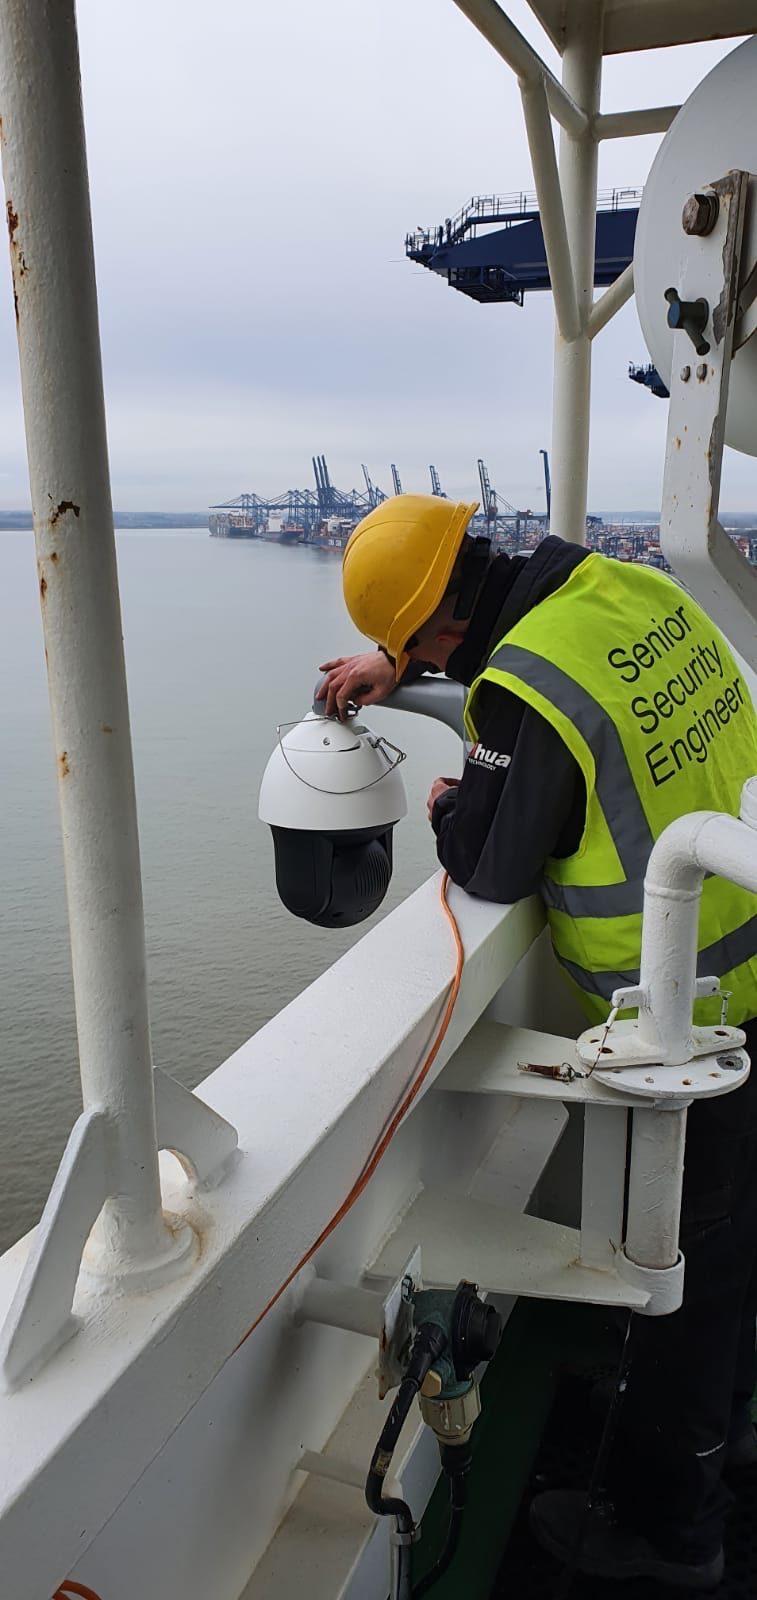 Company Image (Security Smart UK: Onboard)